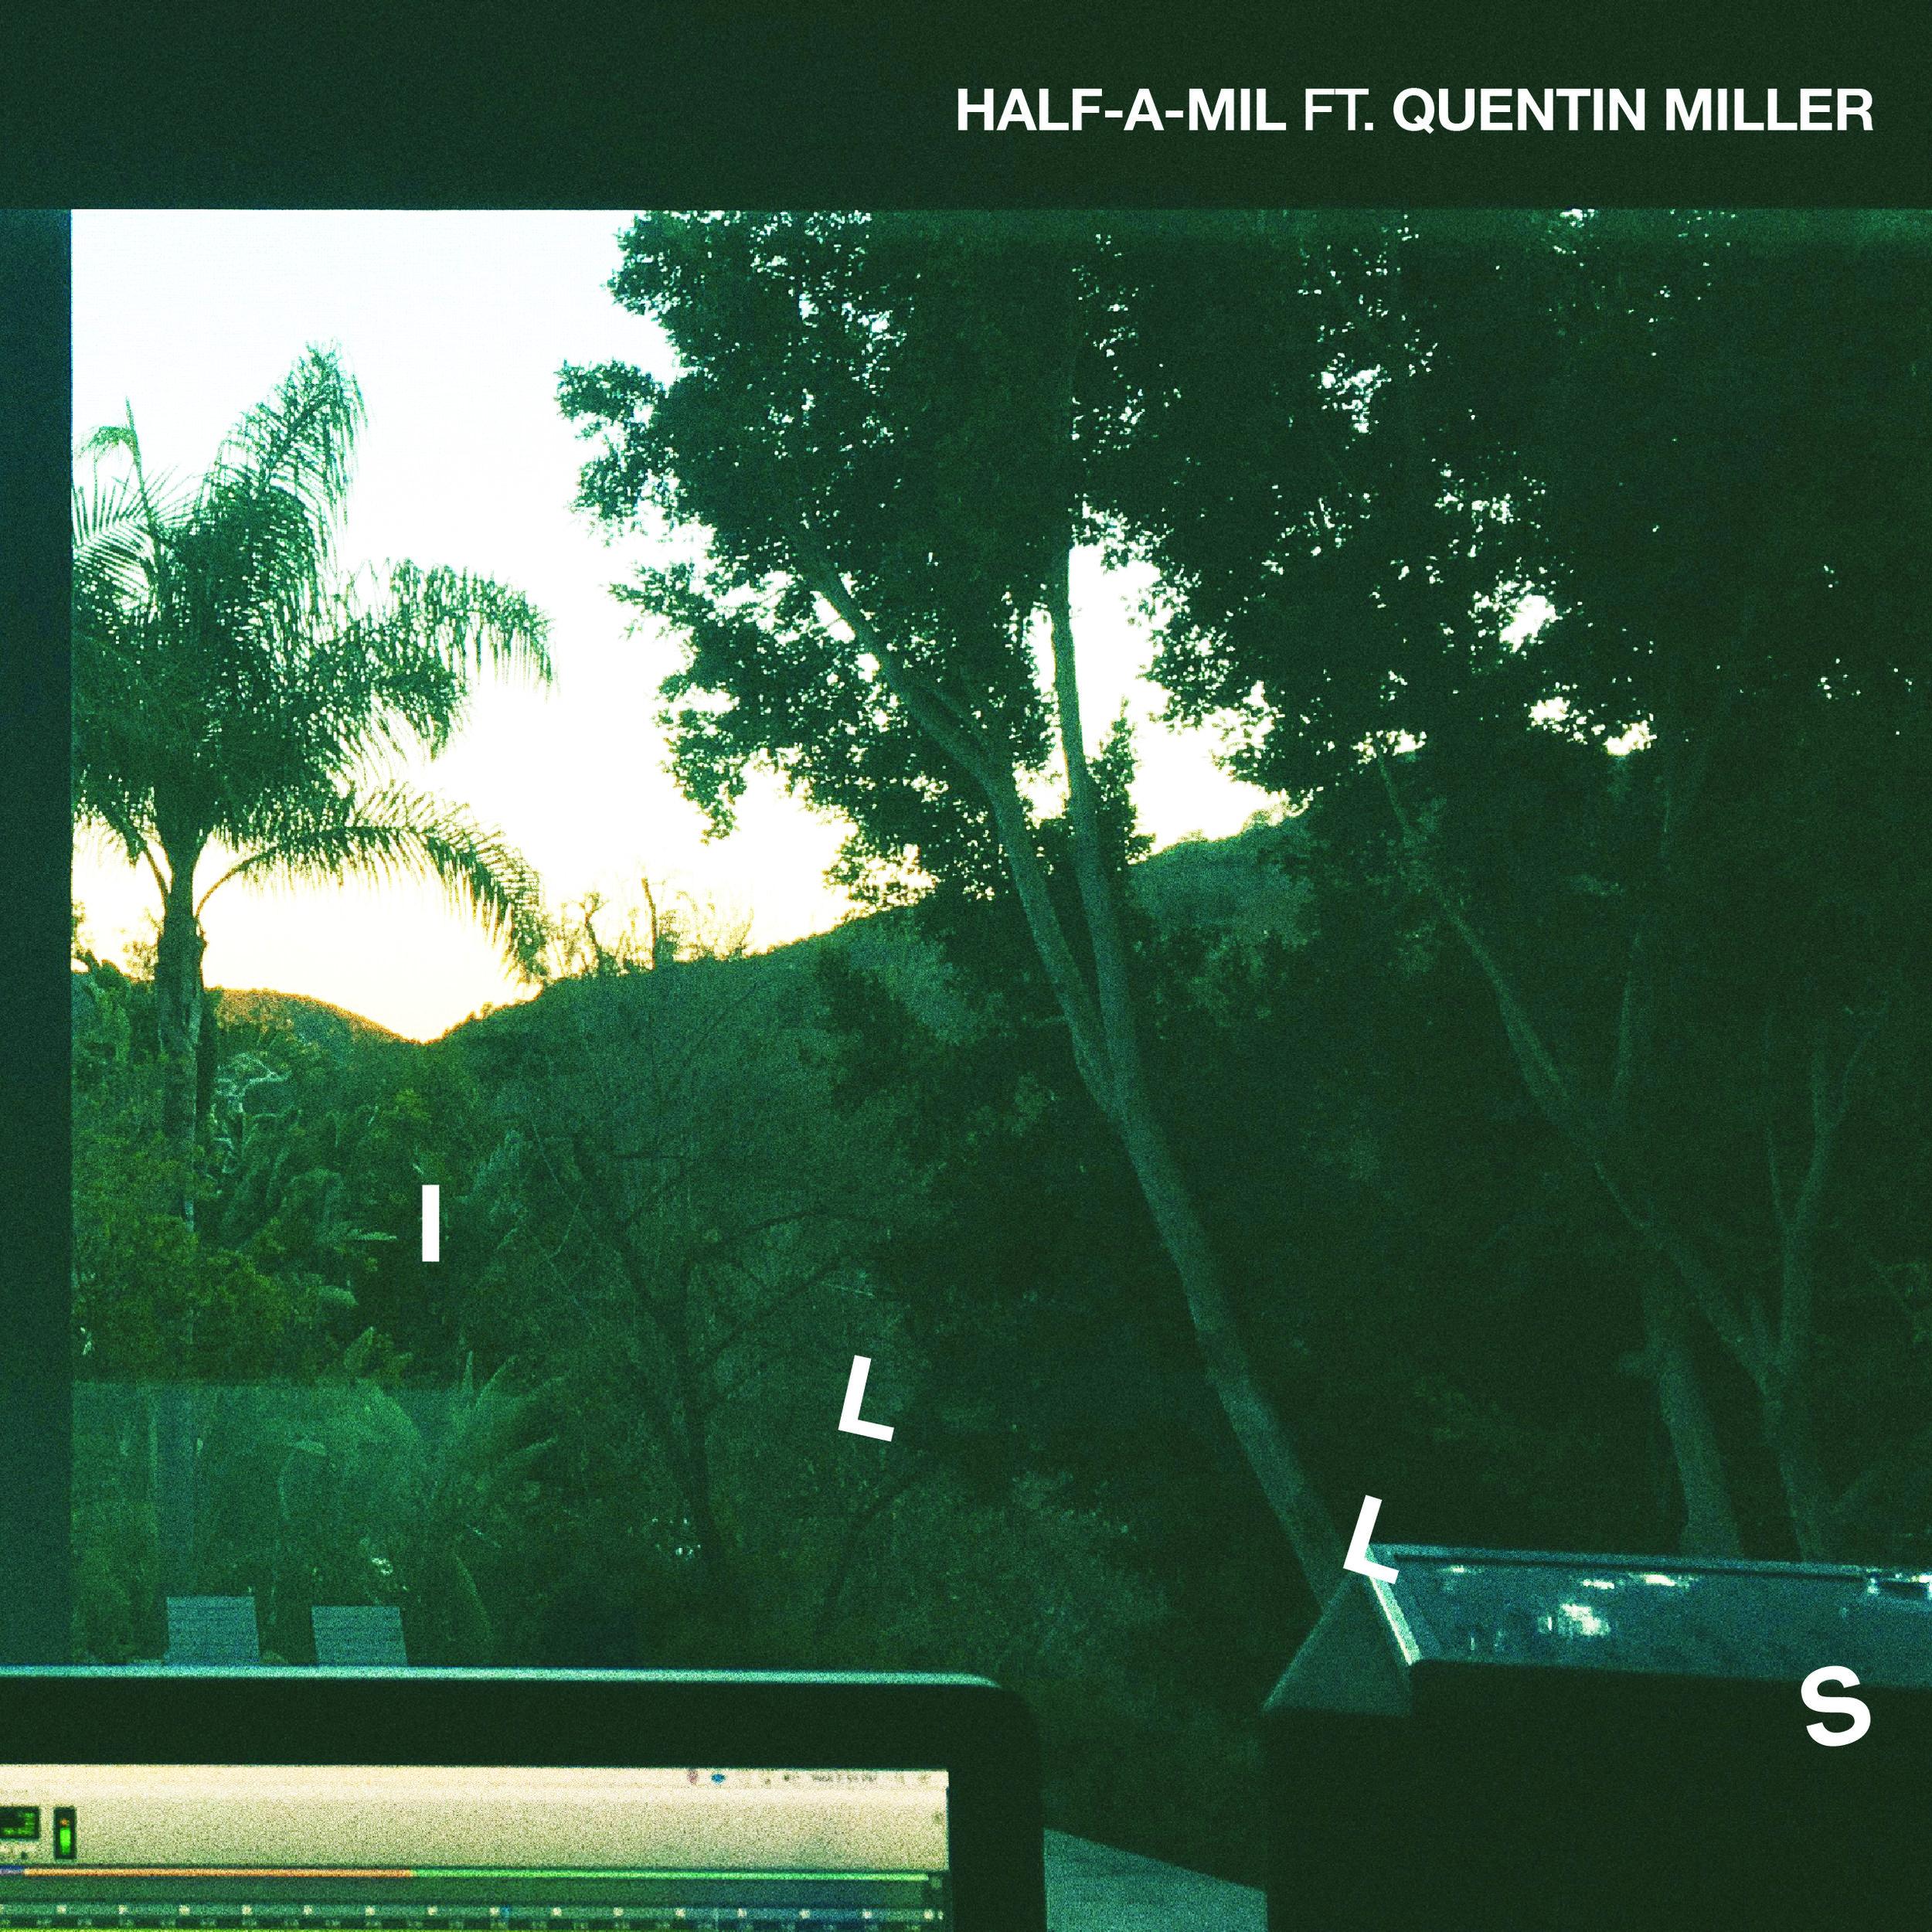 halfamil hills123-06.jpg